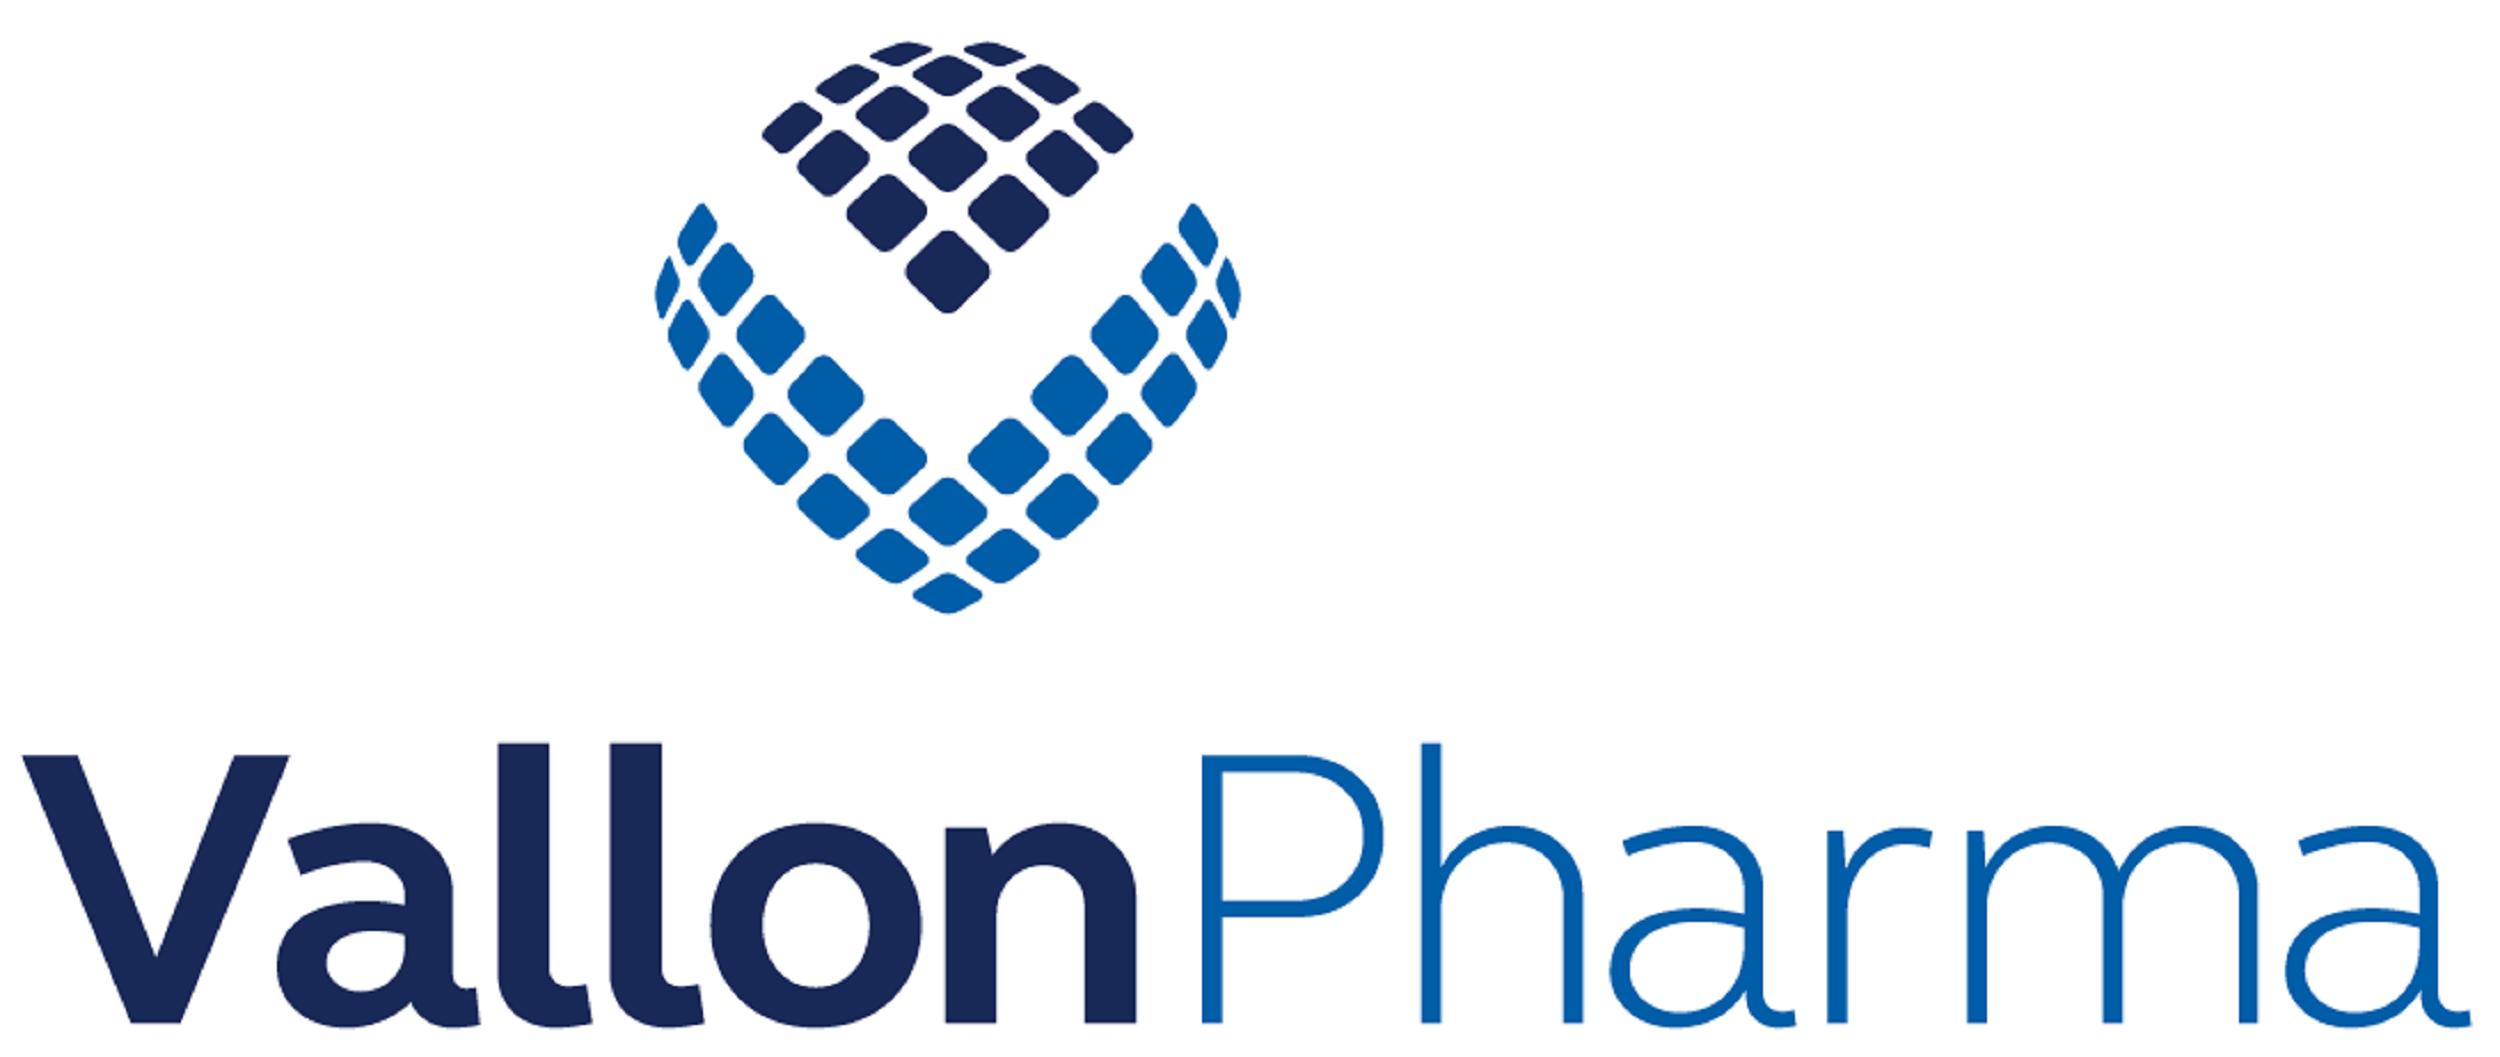 VLON logo